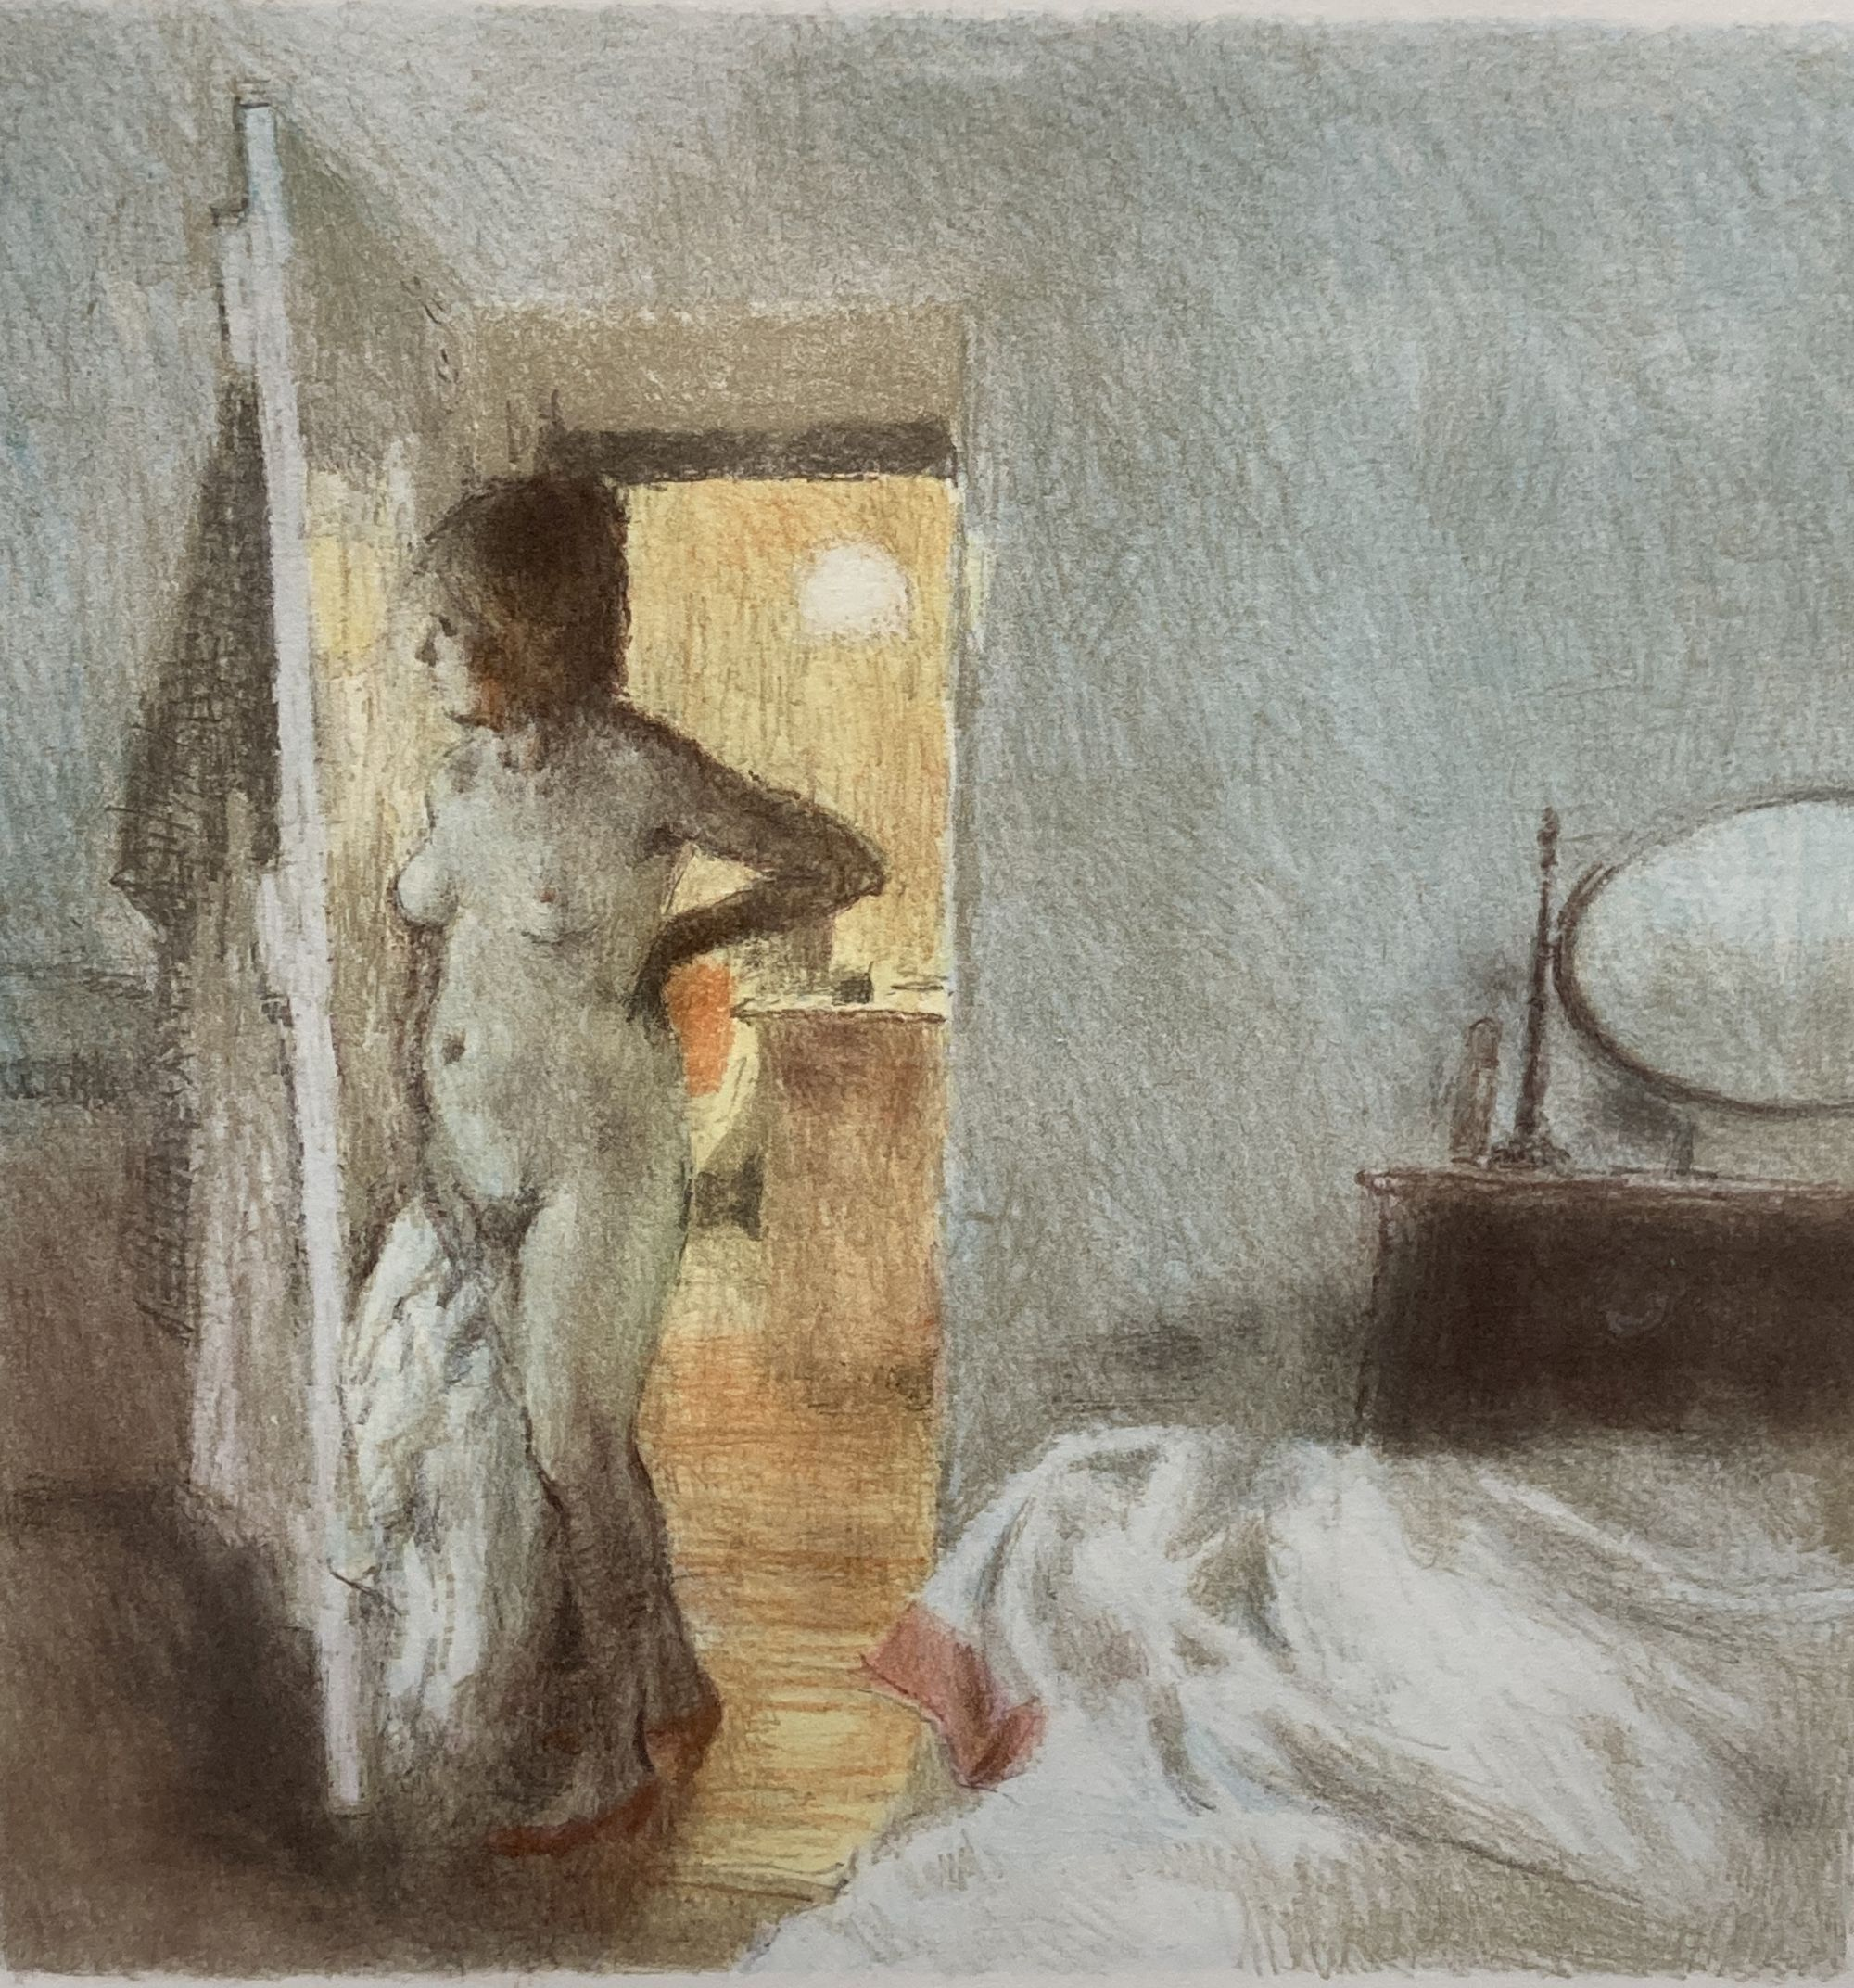 Bernard Dunstan (1920-2017), lithograph, 'Nude I', signed in pencil, 12/95, 40 x 39cm.